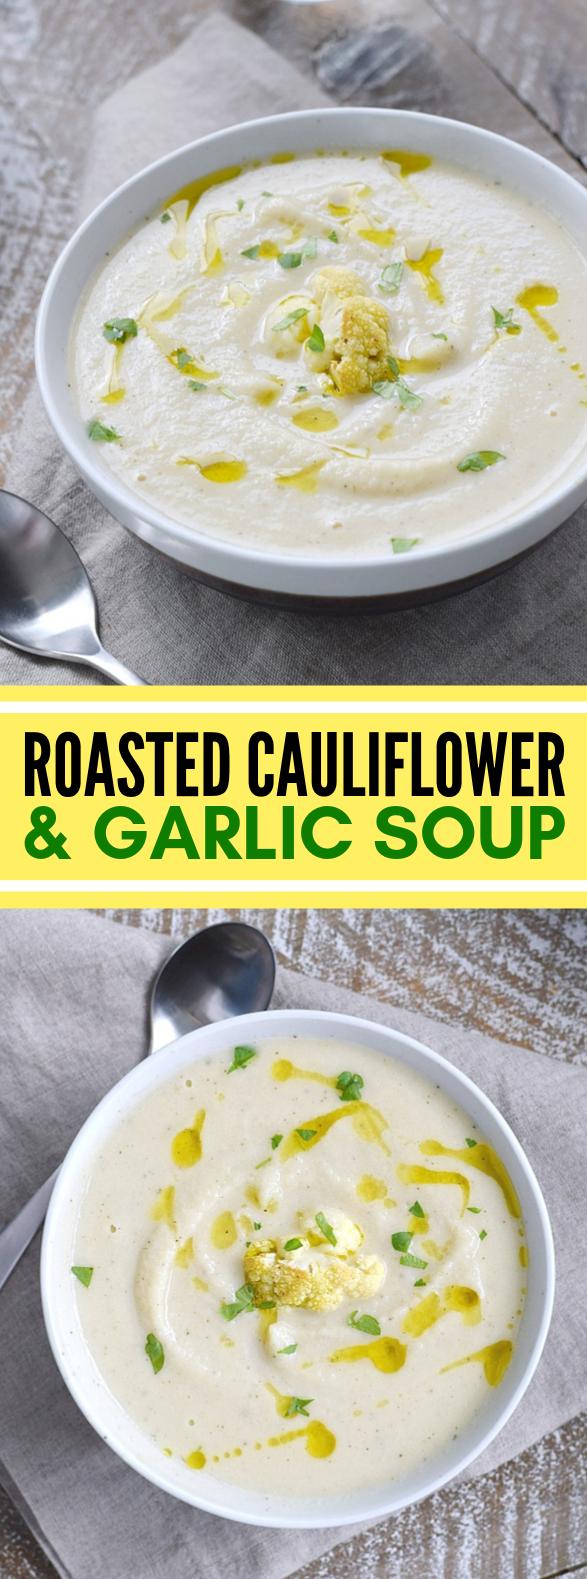 ROASTED CAULIFLOWER AND GARLIC SOUP #vegetarian #whole30